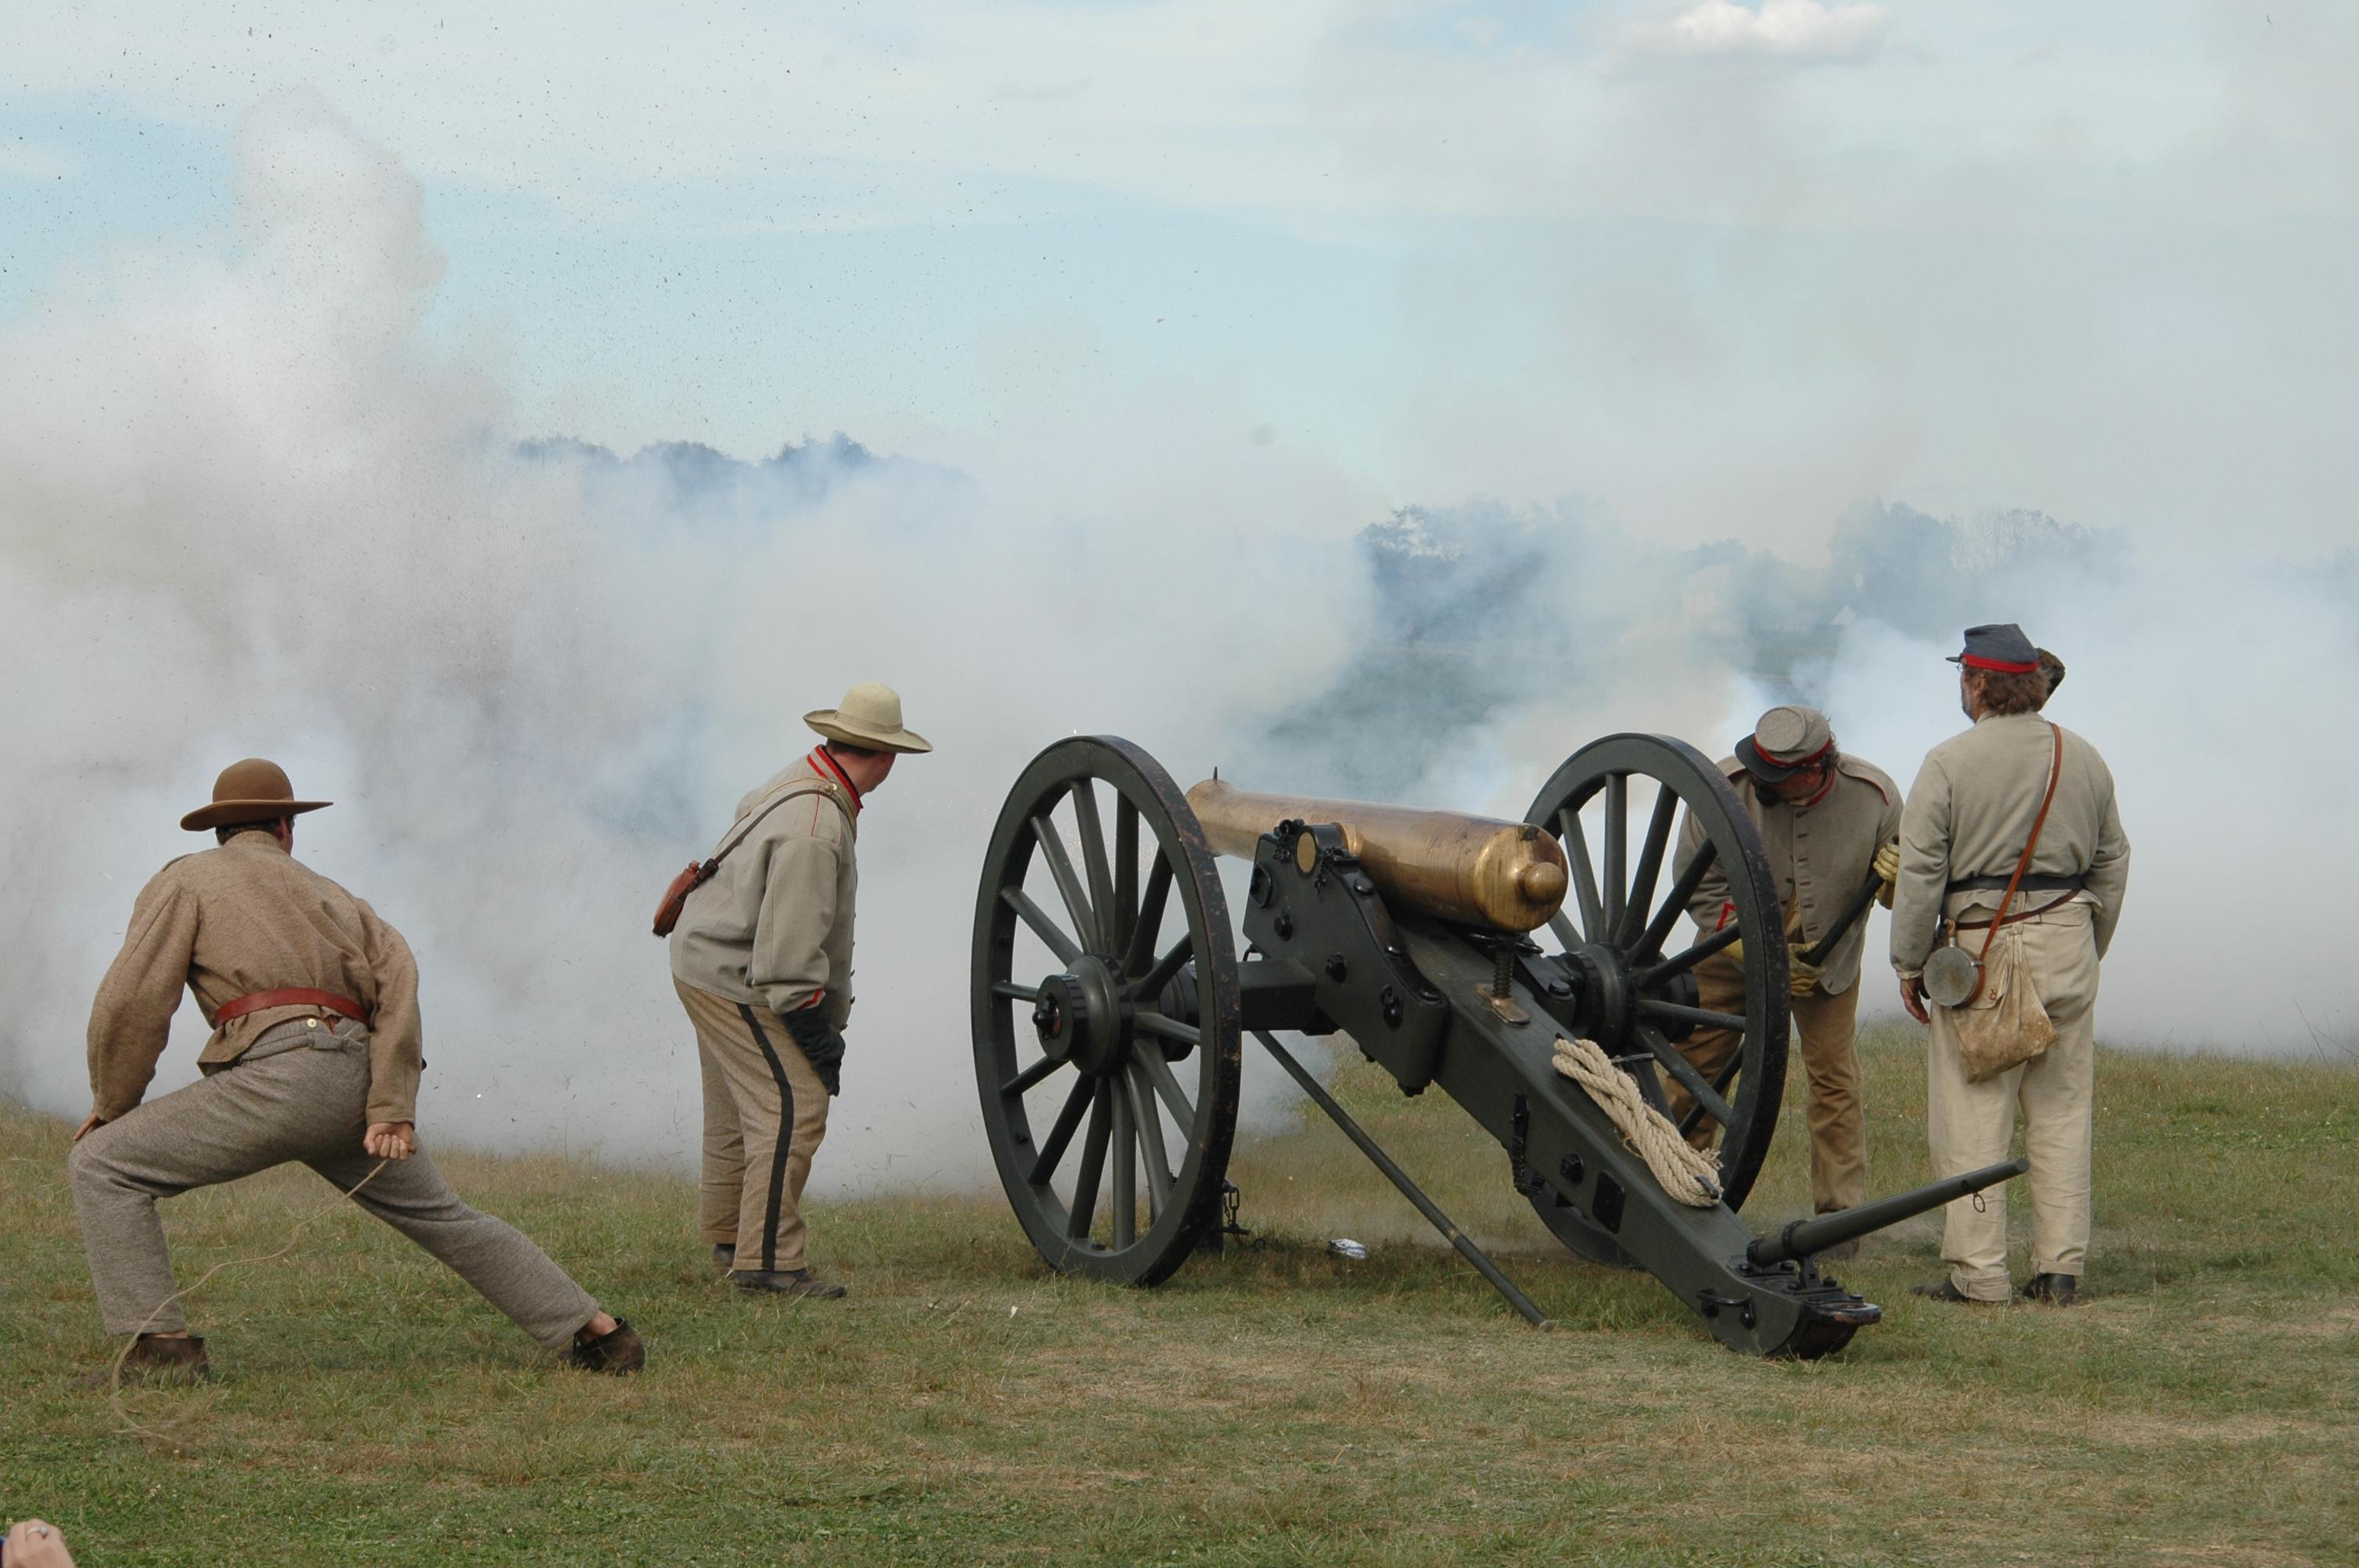 Joe Dobrow color photo of cannon at Antietam 150th anniversary celebration